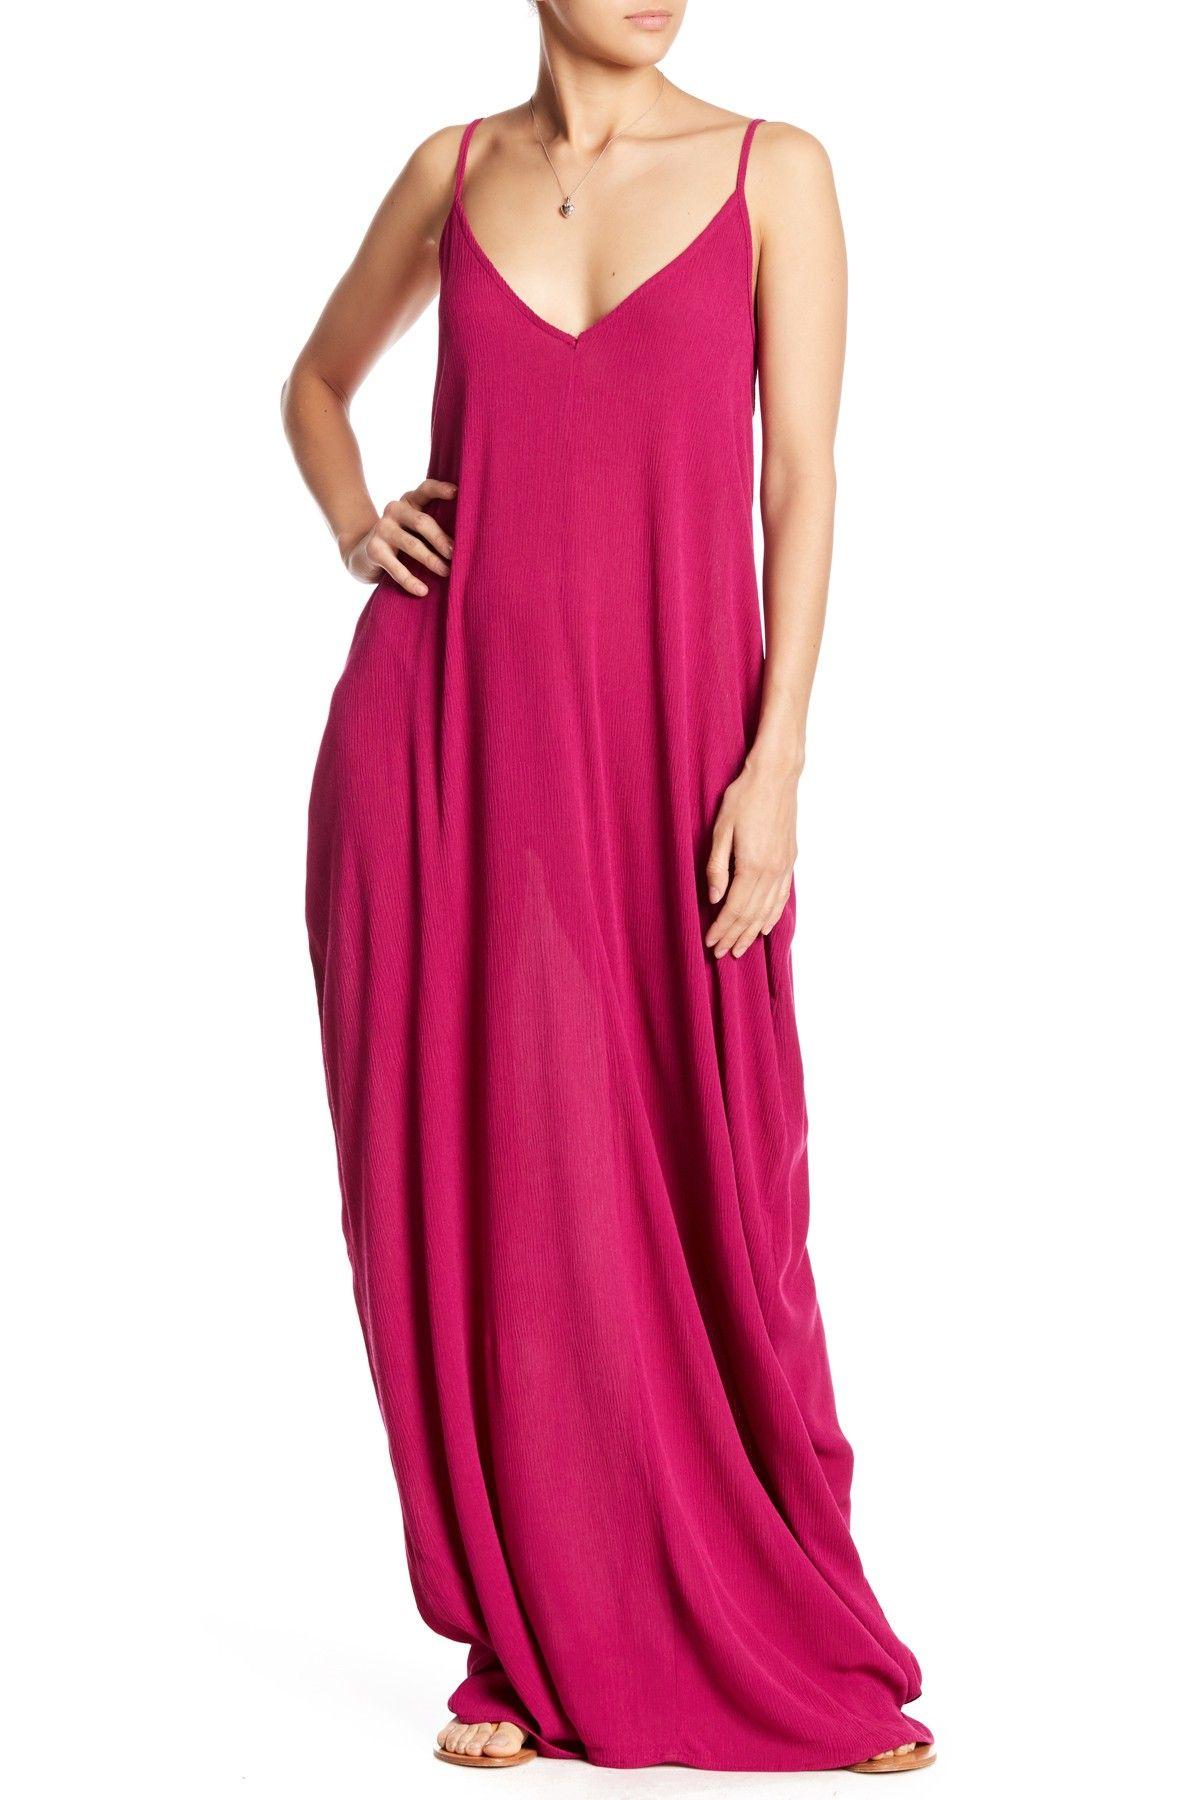 722744ae3a7 V-Neck Sleeveless Gauze Maxi Dress in 2019 | Fashion | Dresses ...